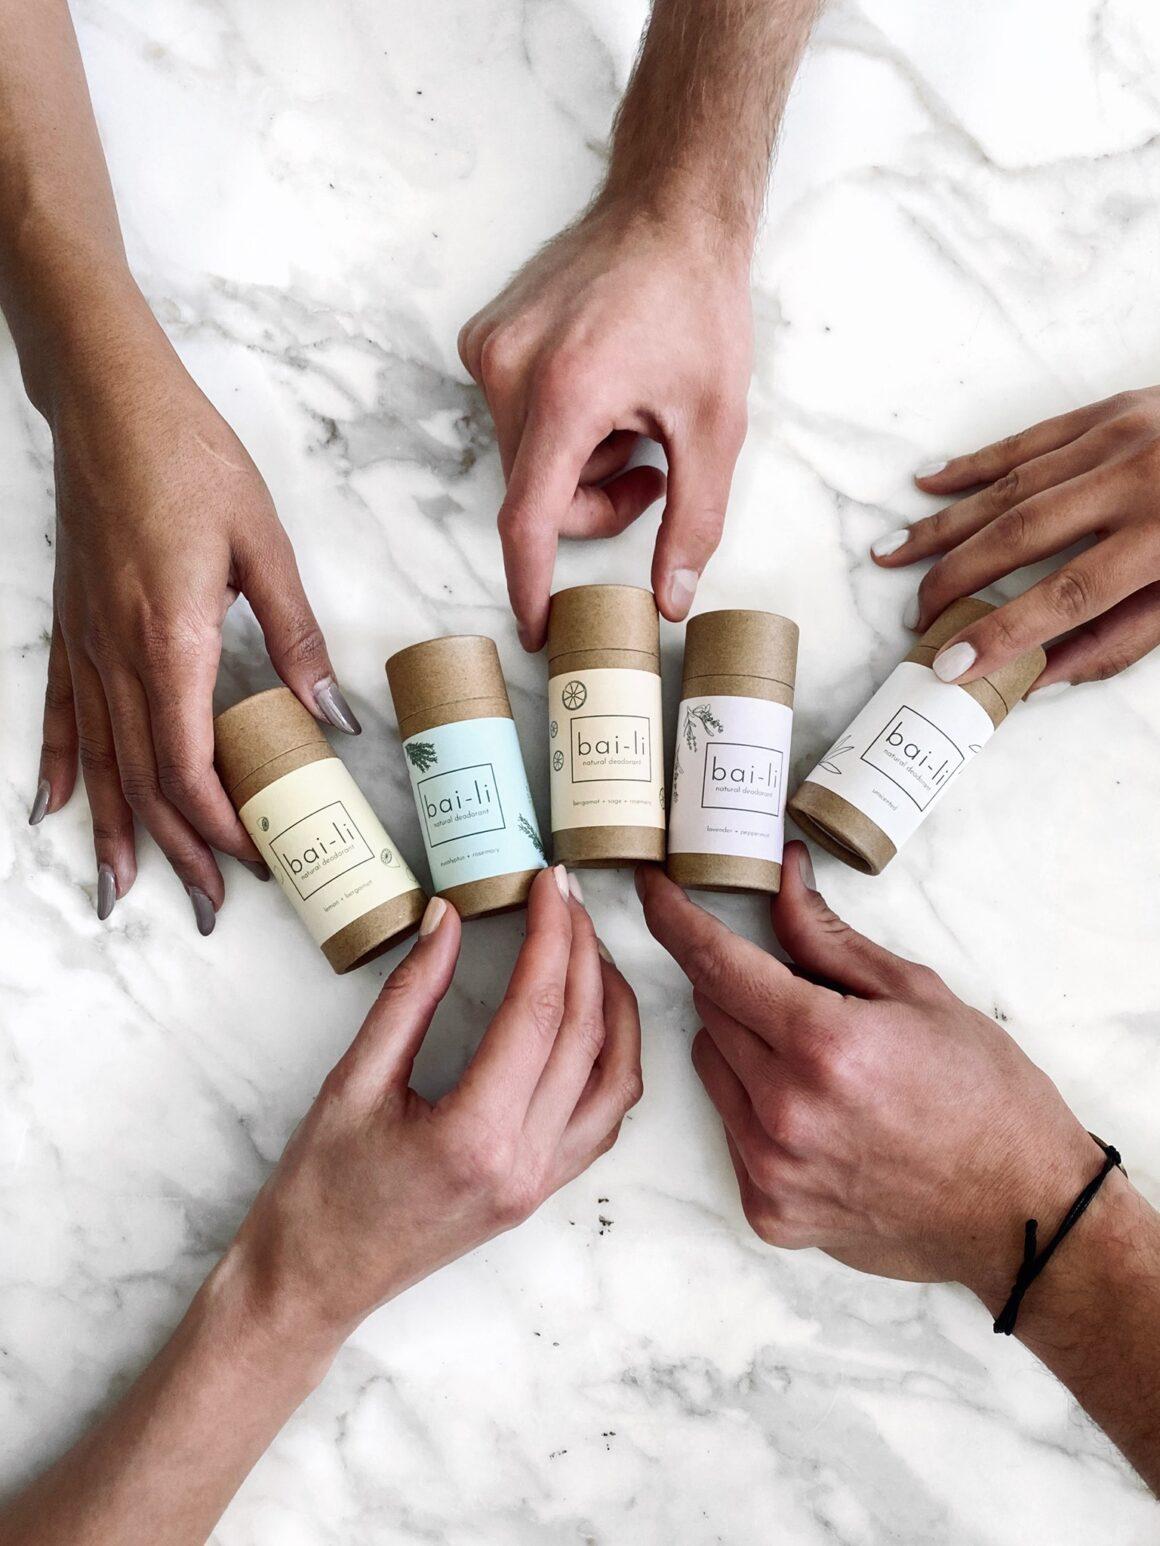 The Best All-Natural and Organic Deodorants - Bai-Li